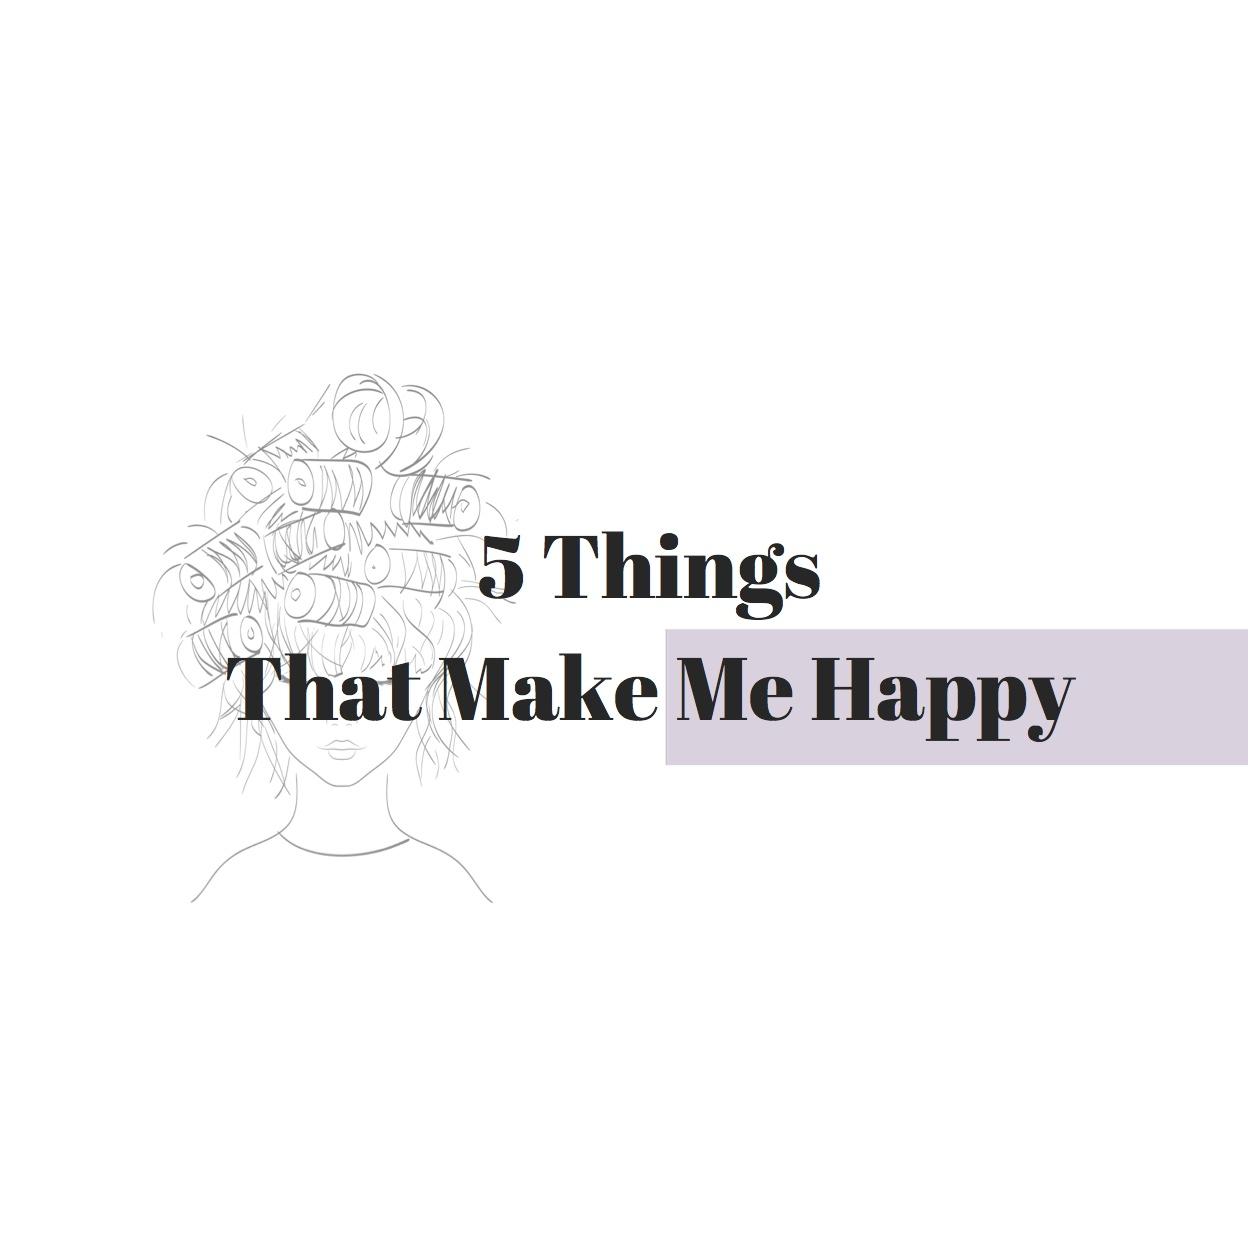 5 Things That Make Me Happy (Series)